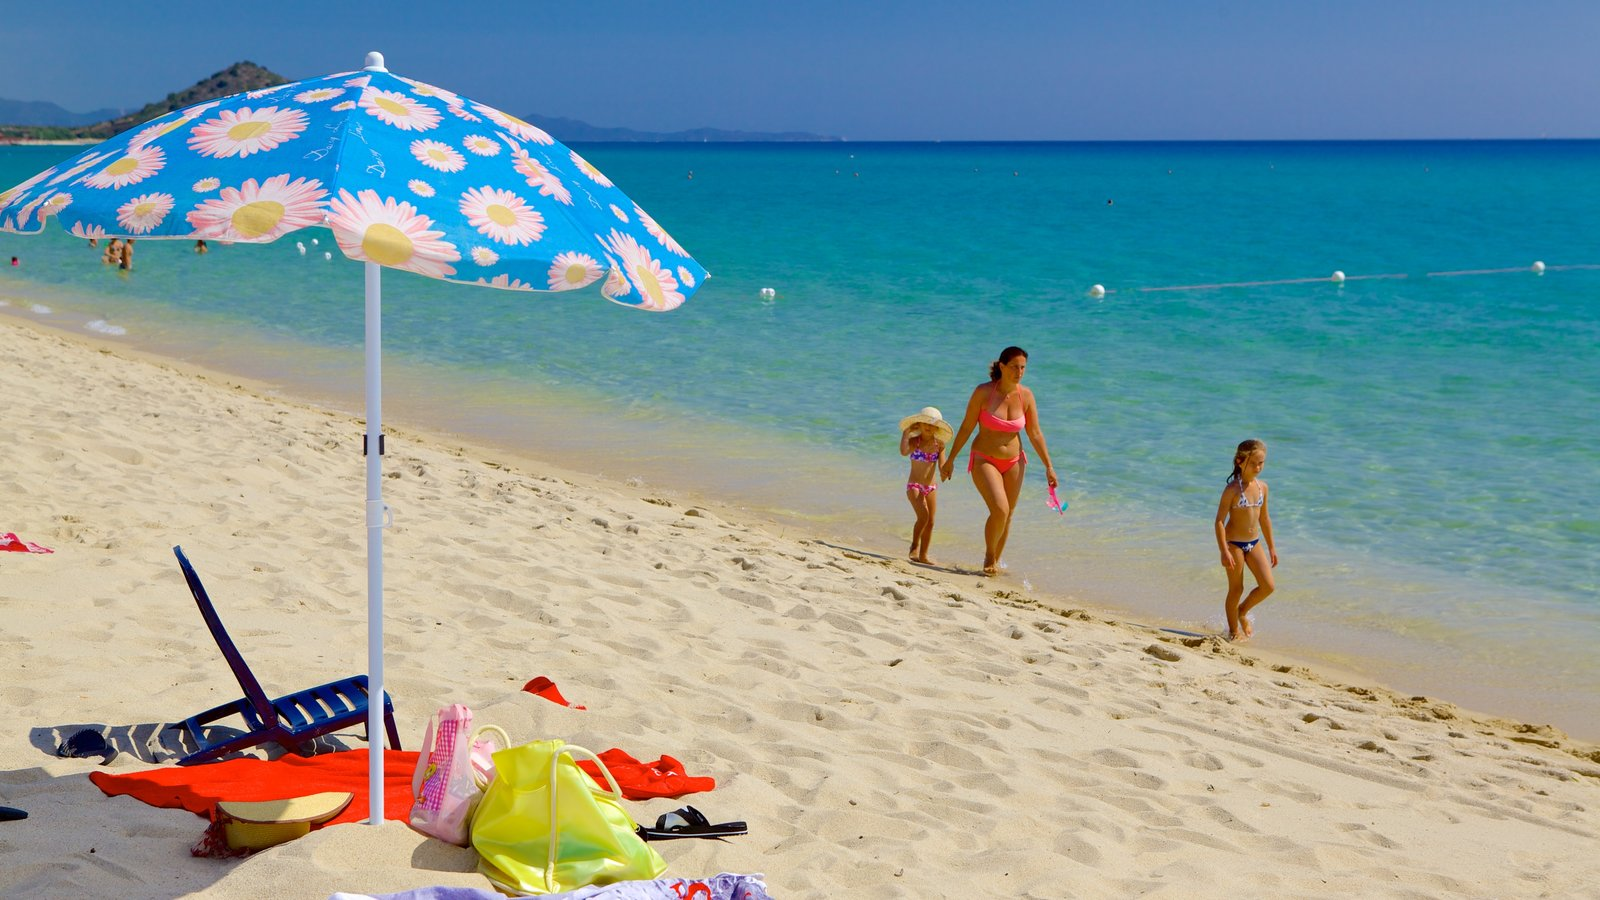 Cala Sinzias featuring a beach as well as a family